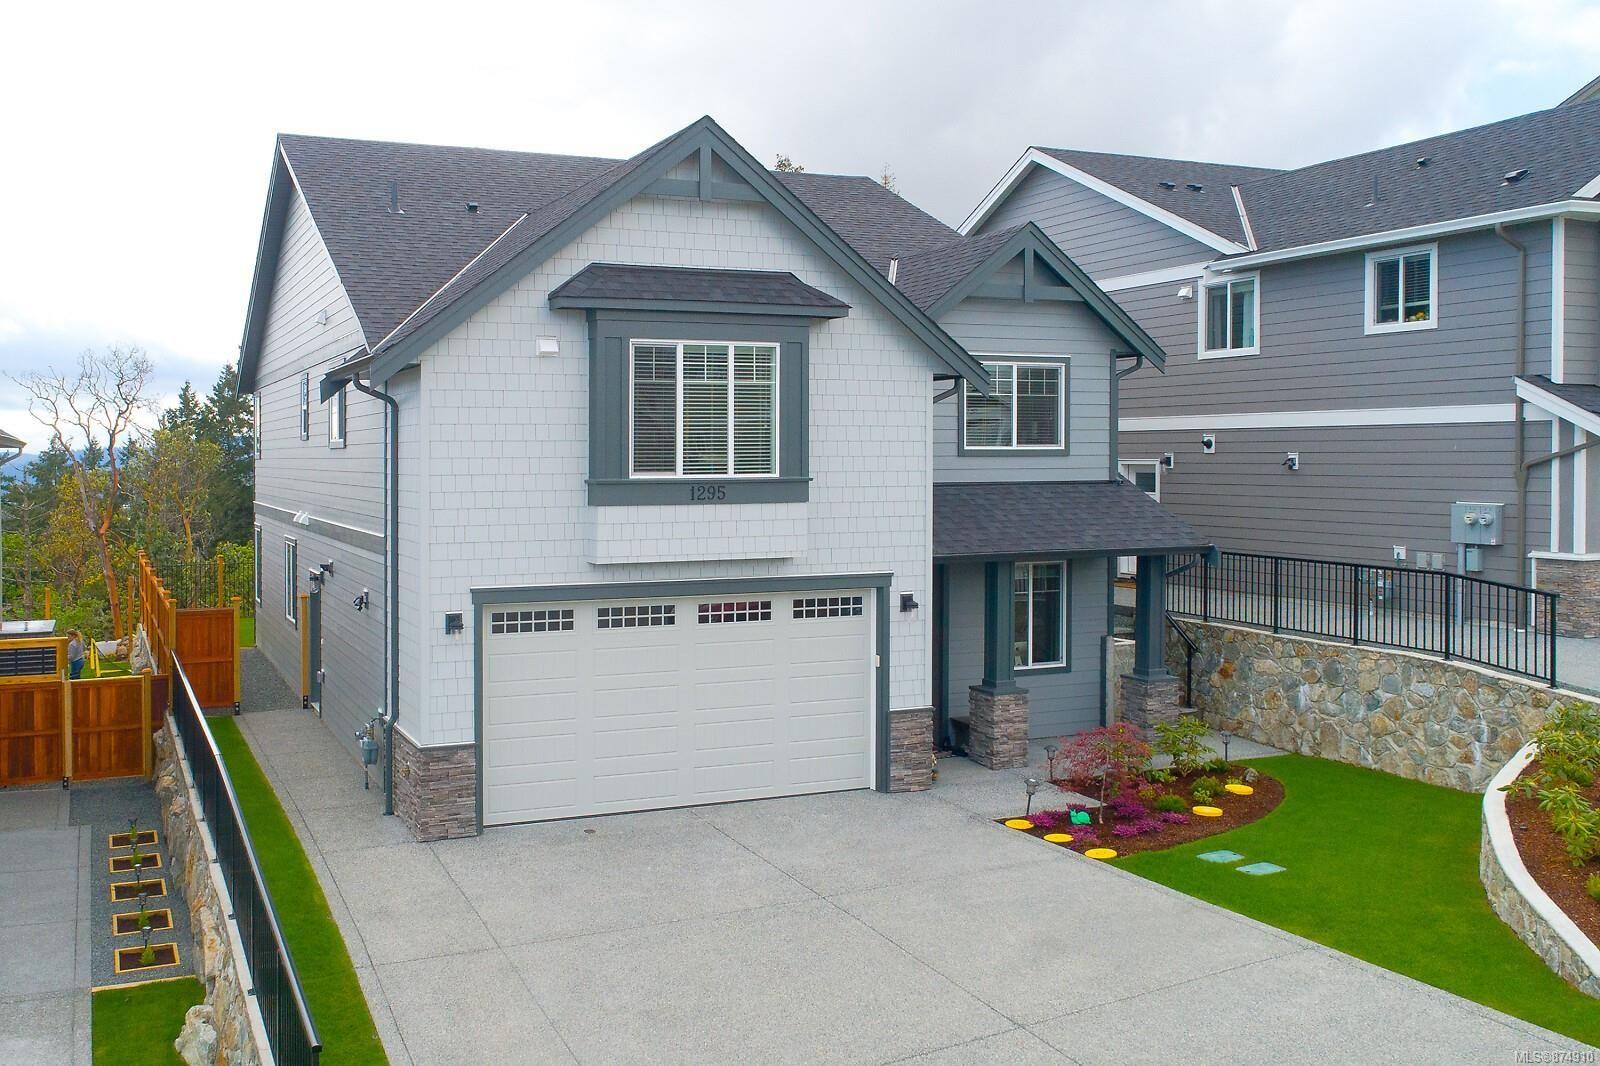 Main Photo: 1295 Flint Ave in : La Bear Mountain House for sale (Langford)  : MLS®# 874910